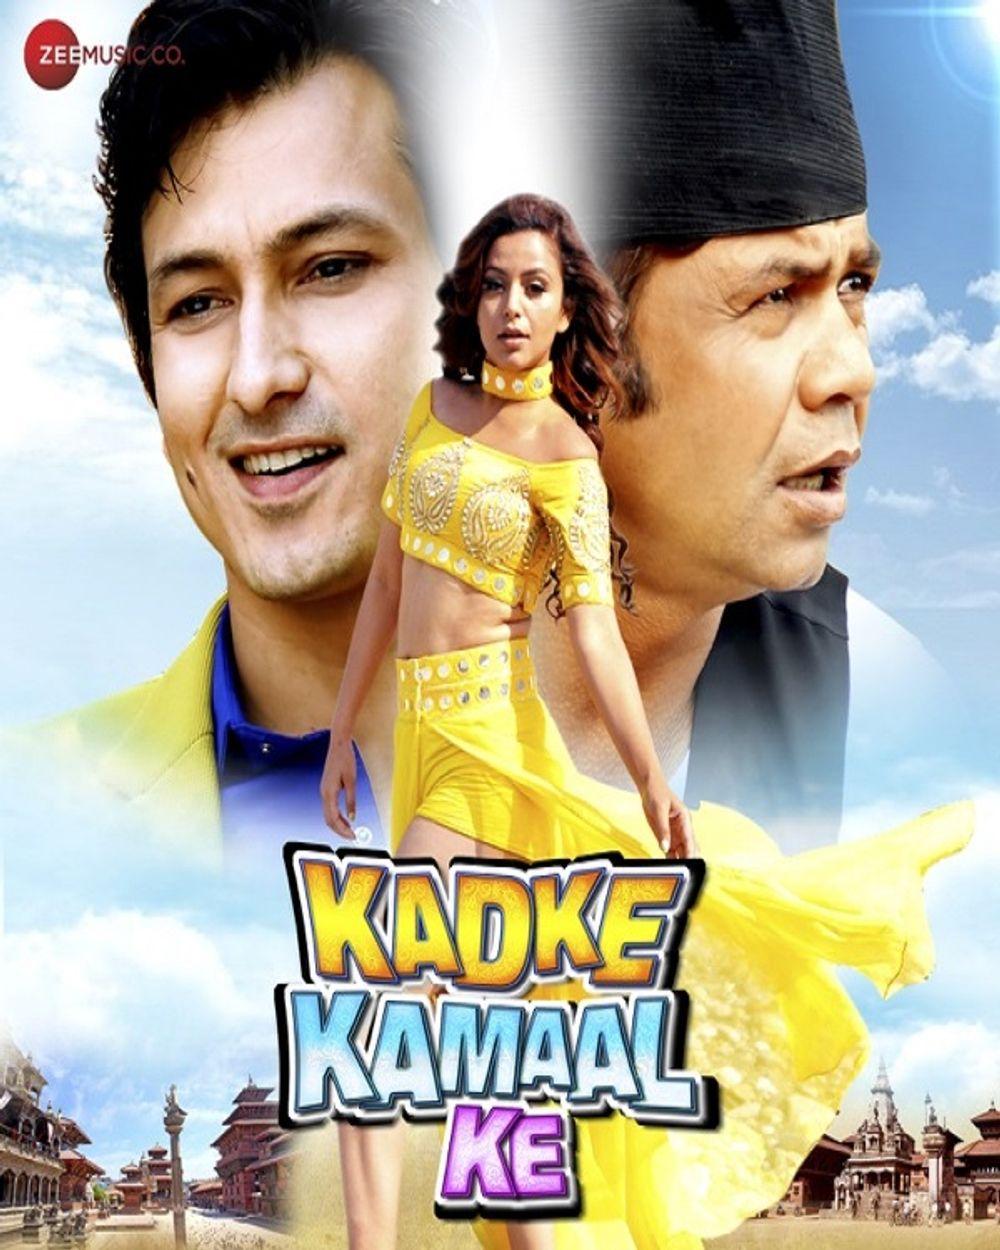 Kadke Kamal Ke 2019 Hindi 720p HDRip x264 AAC Full Bollywood Movie [1.2GB]